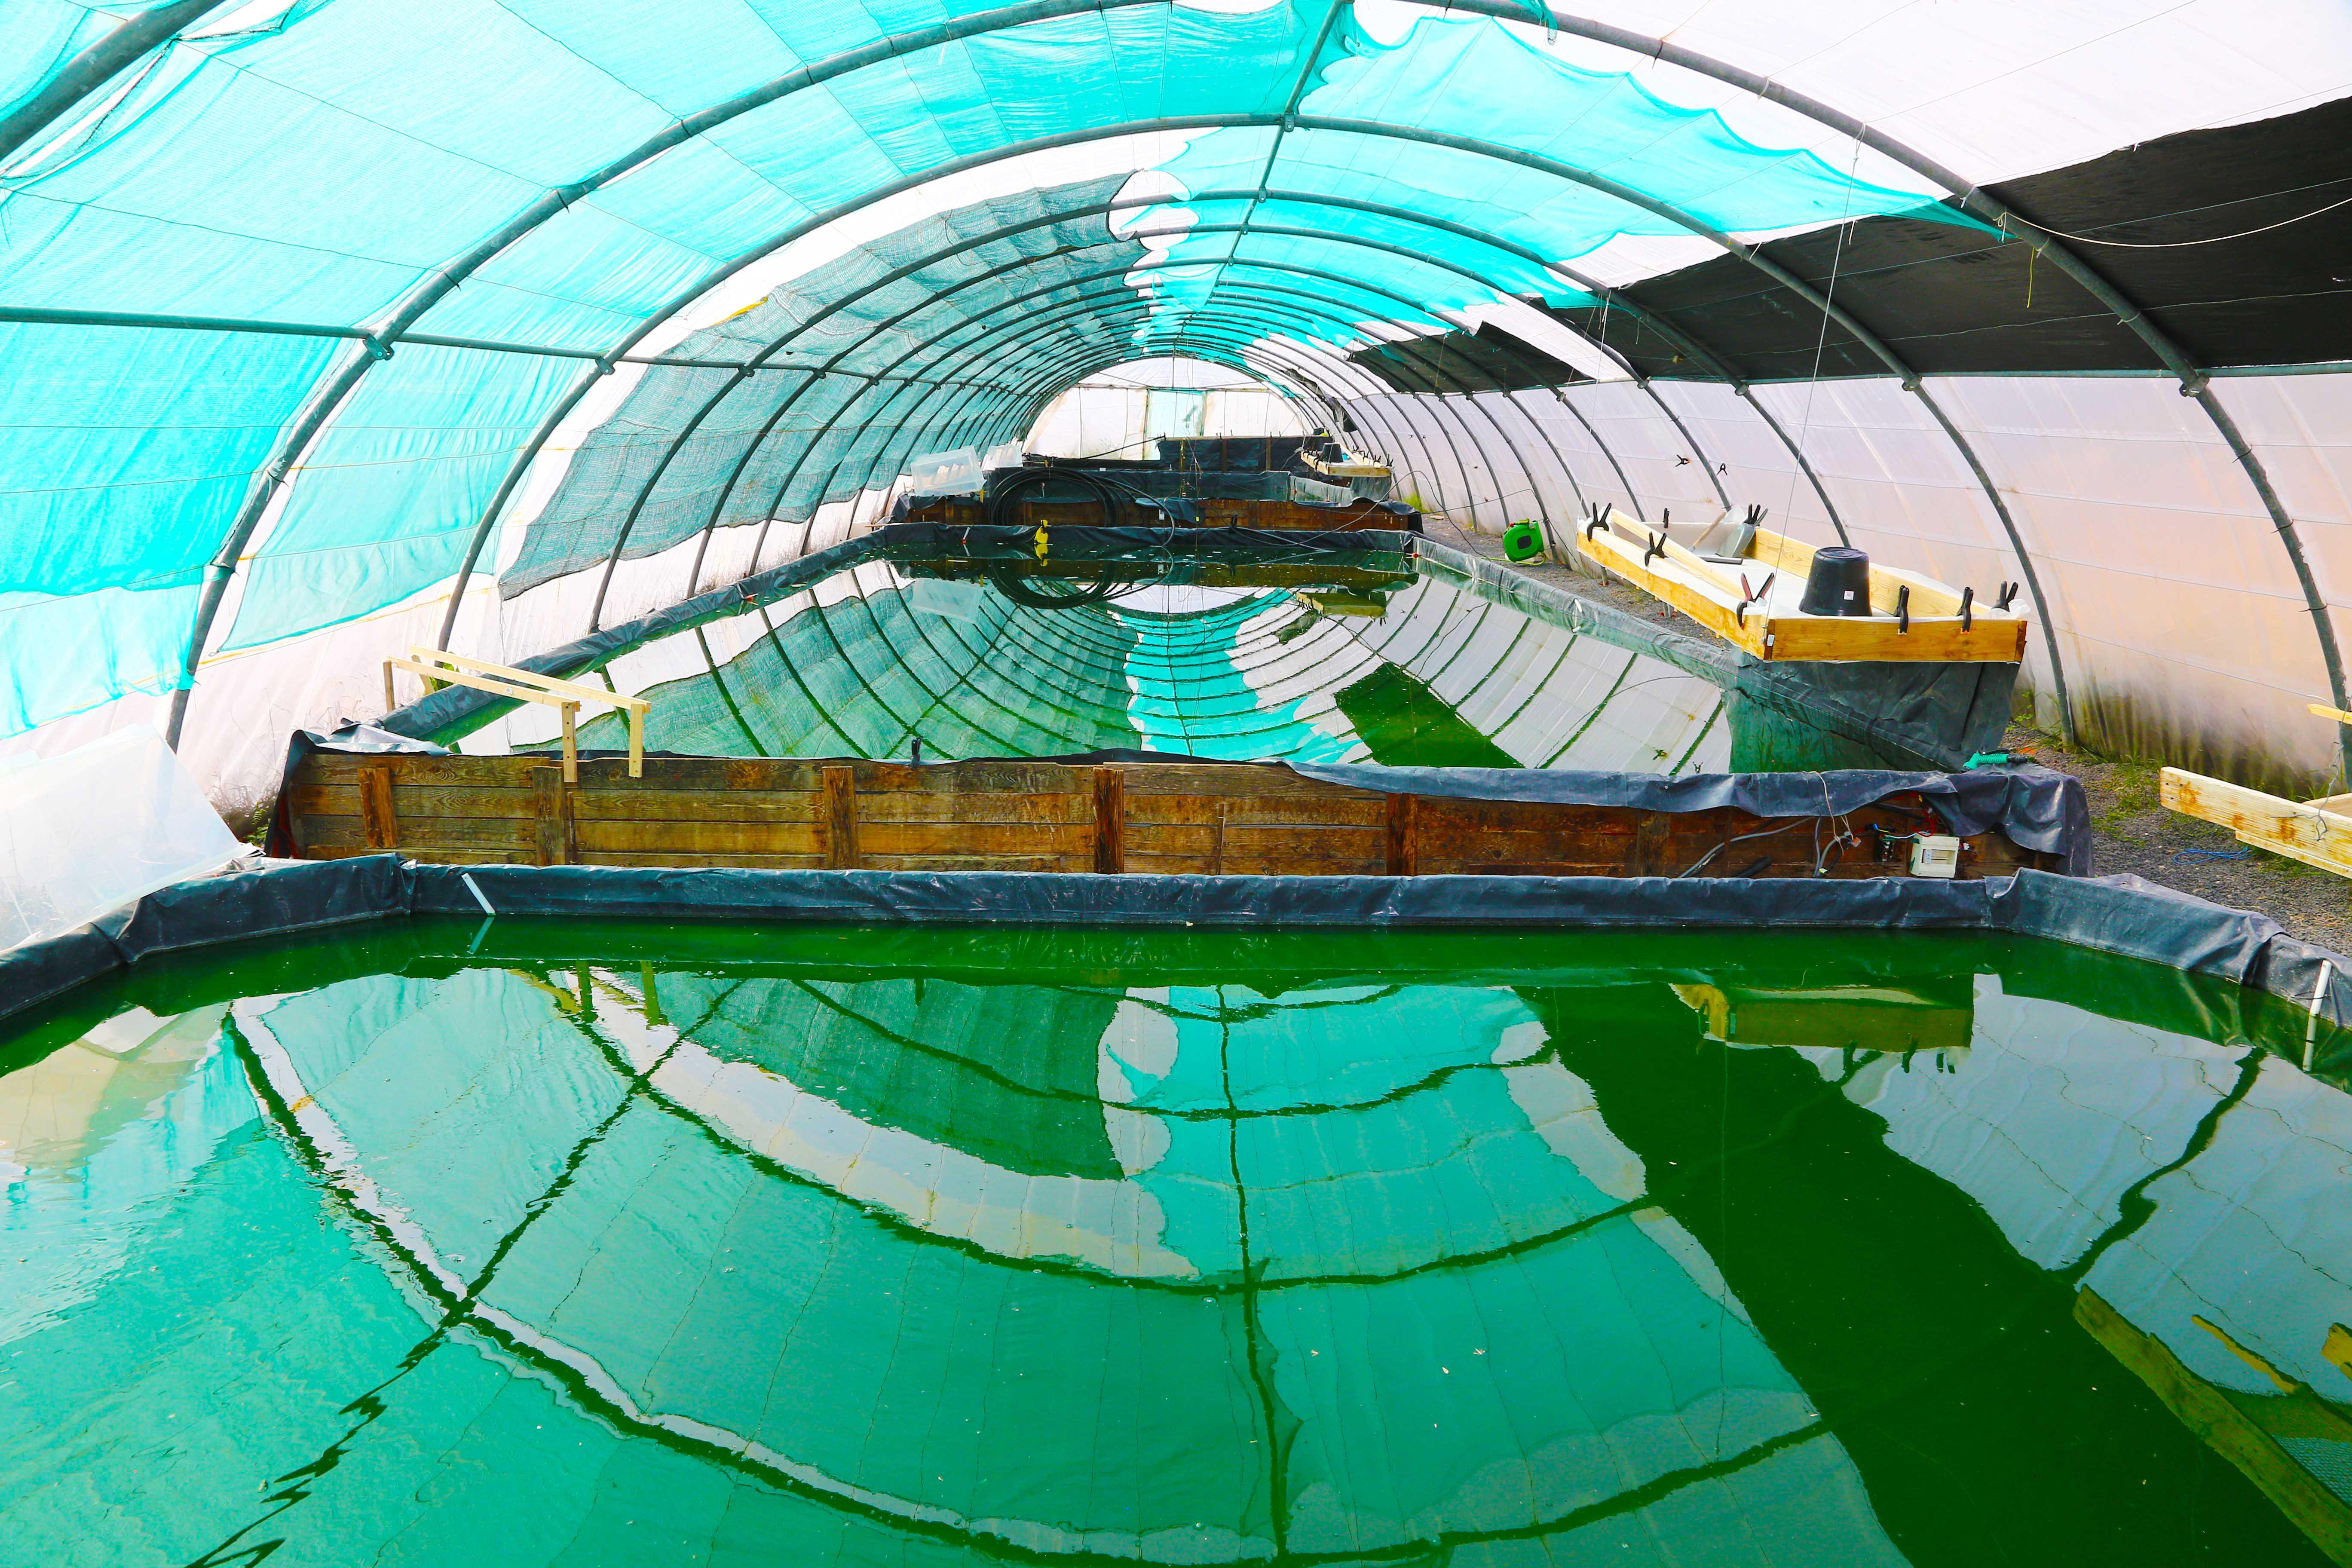 Bassins de culture de Spiruline